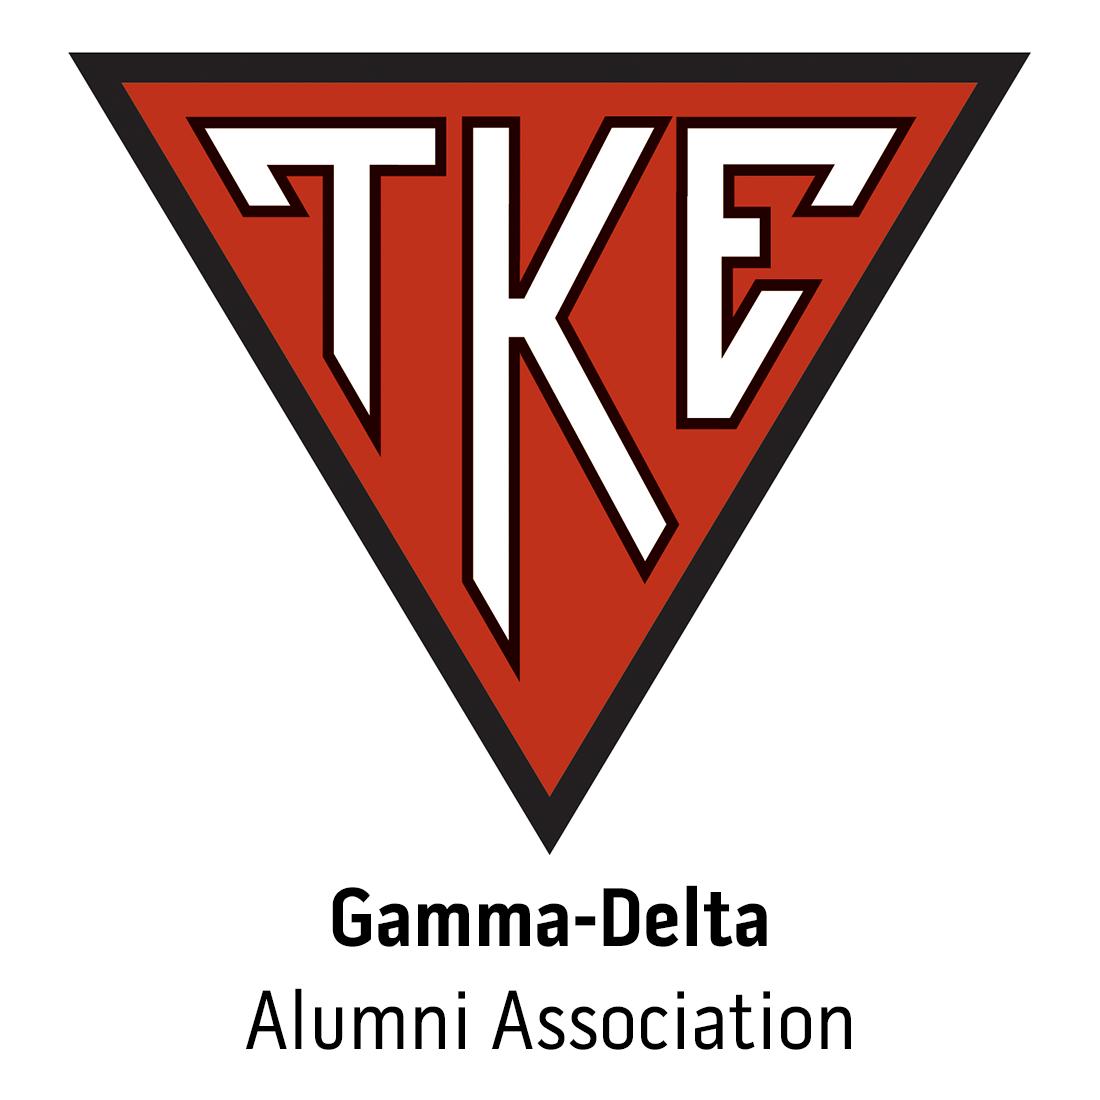 Gamma-Delta Alumni Association for University of Miami